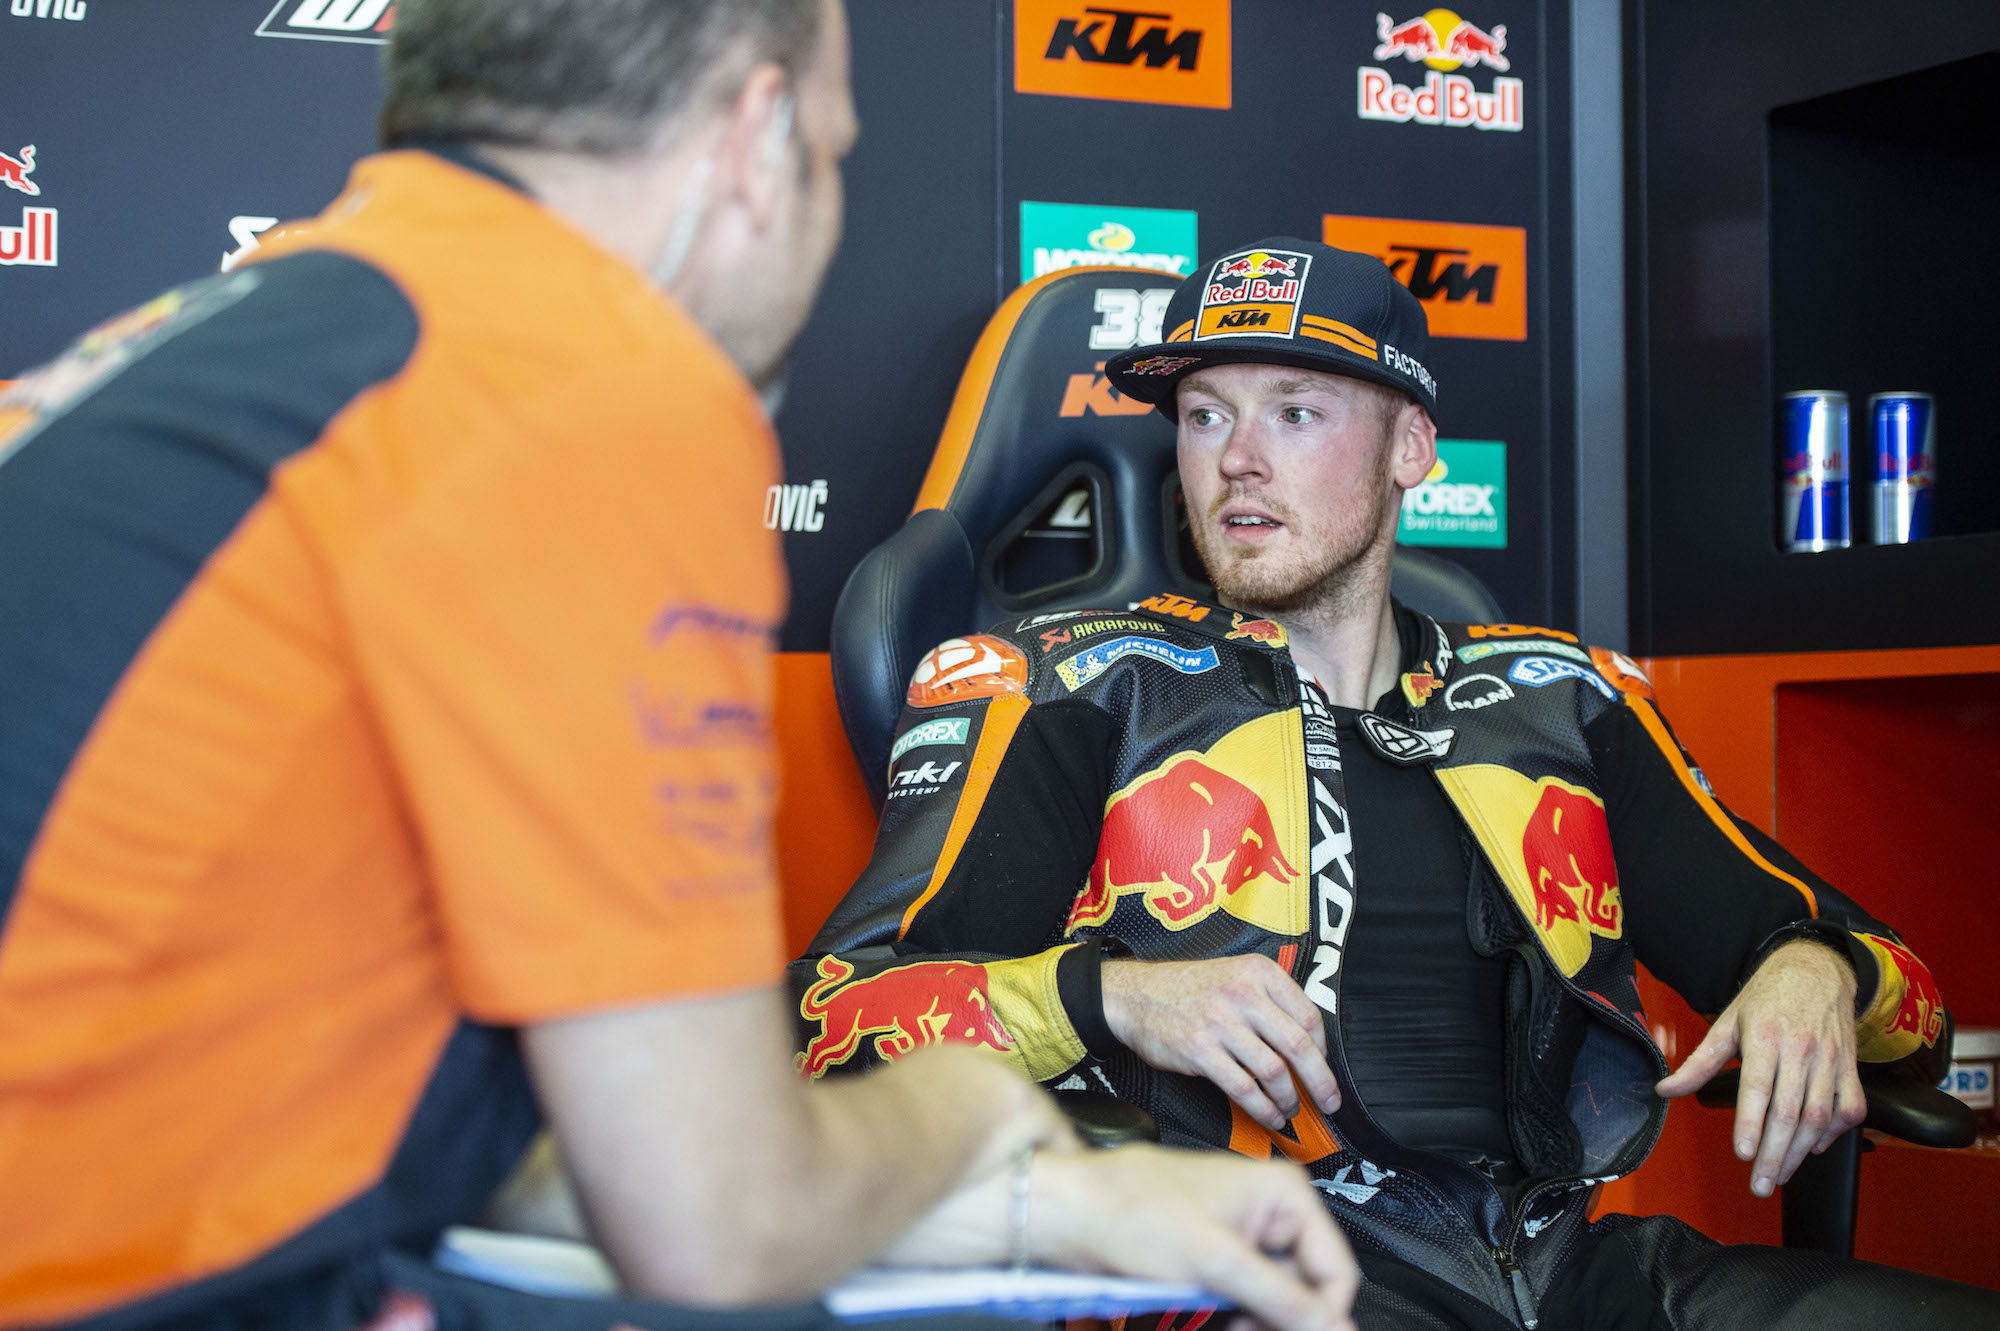 Bradley Smith, piloto de pruebas de Aprilia en MotoGP